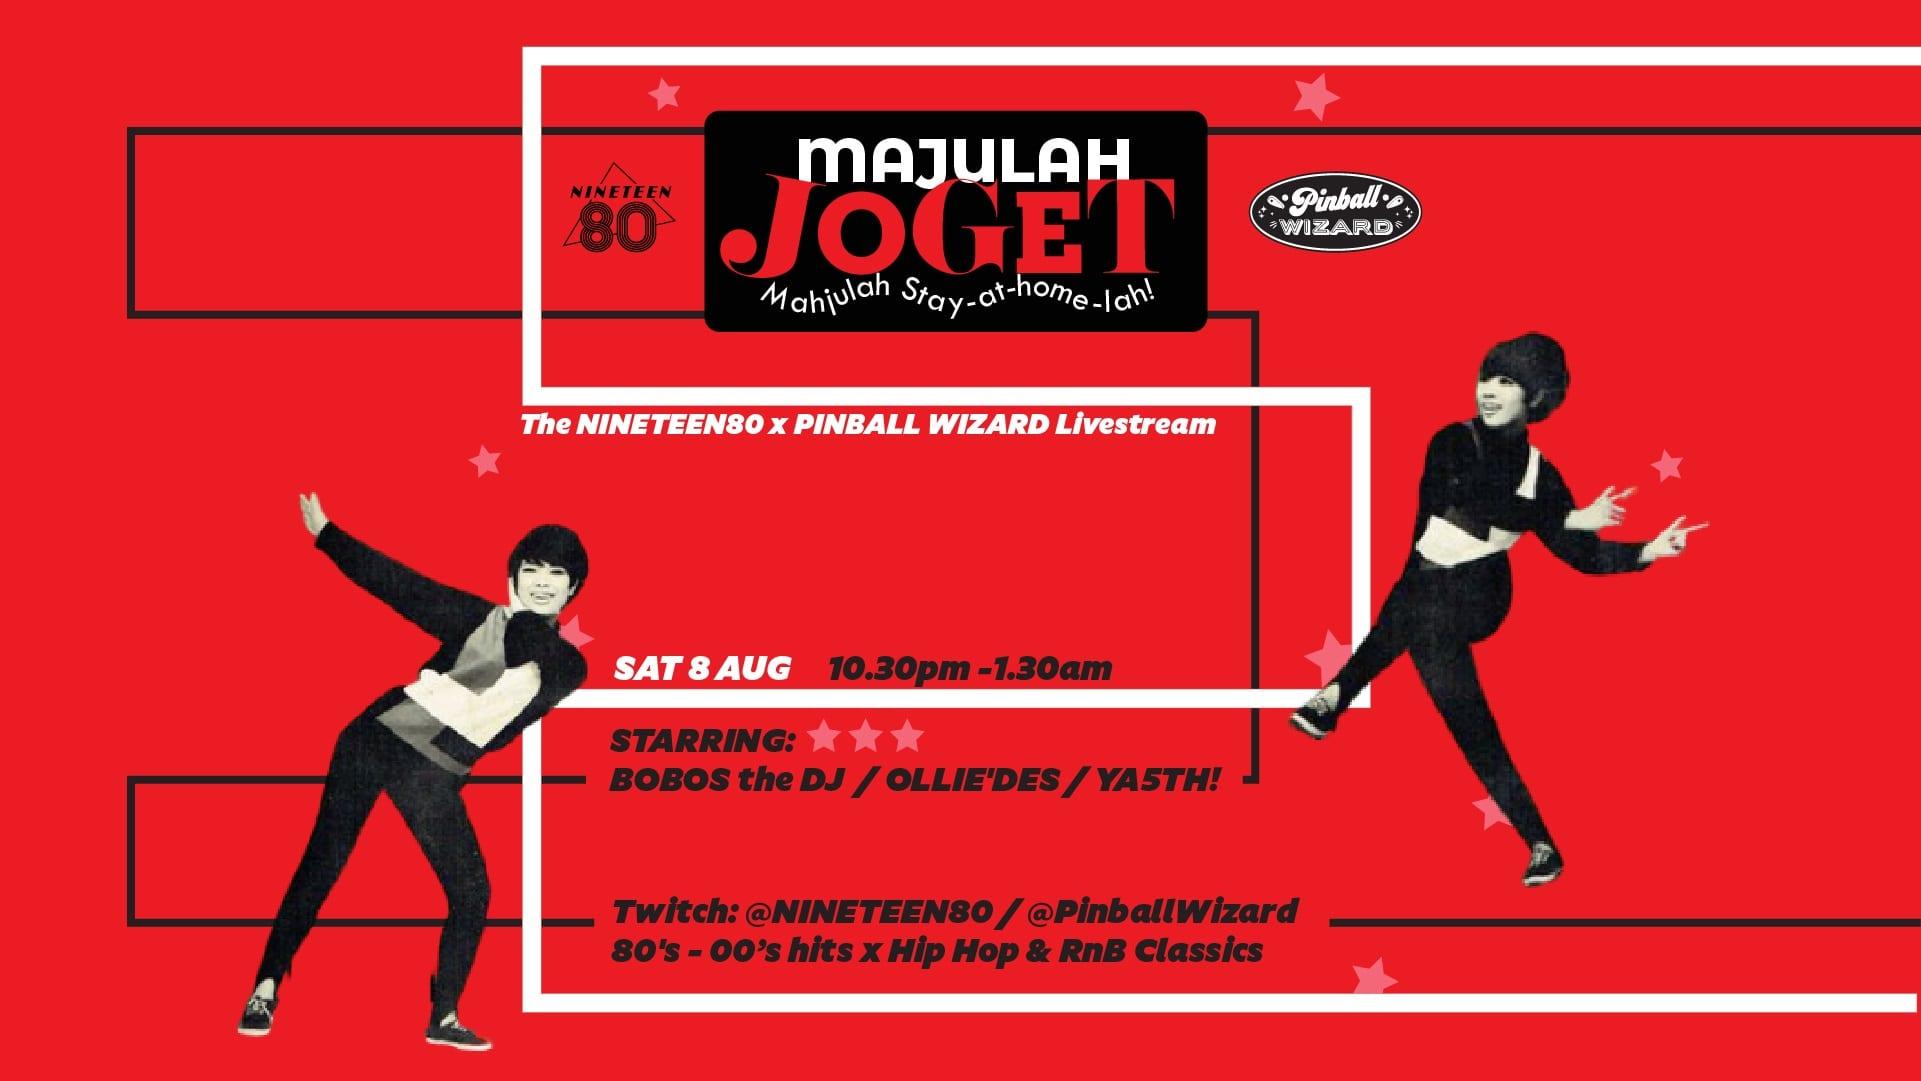 Majulah Joget! NINETEEN80 x Pinball Wizard Crossover National Day Digital Bash